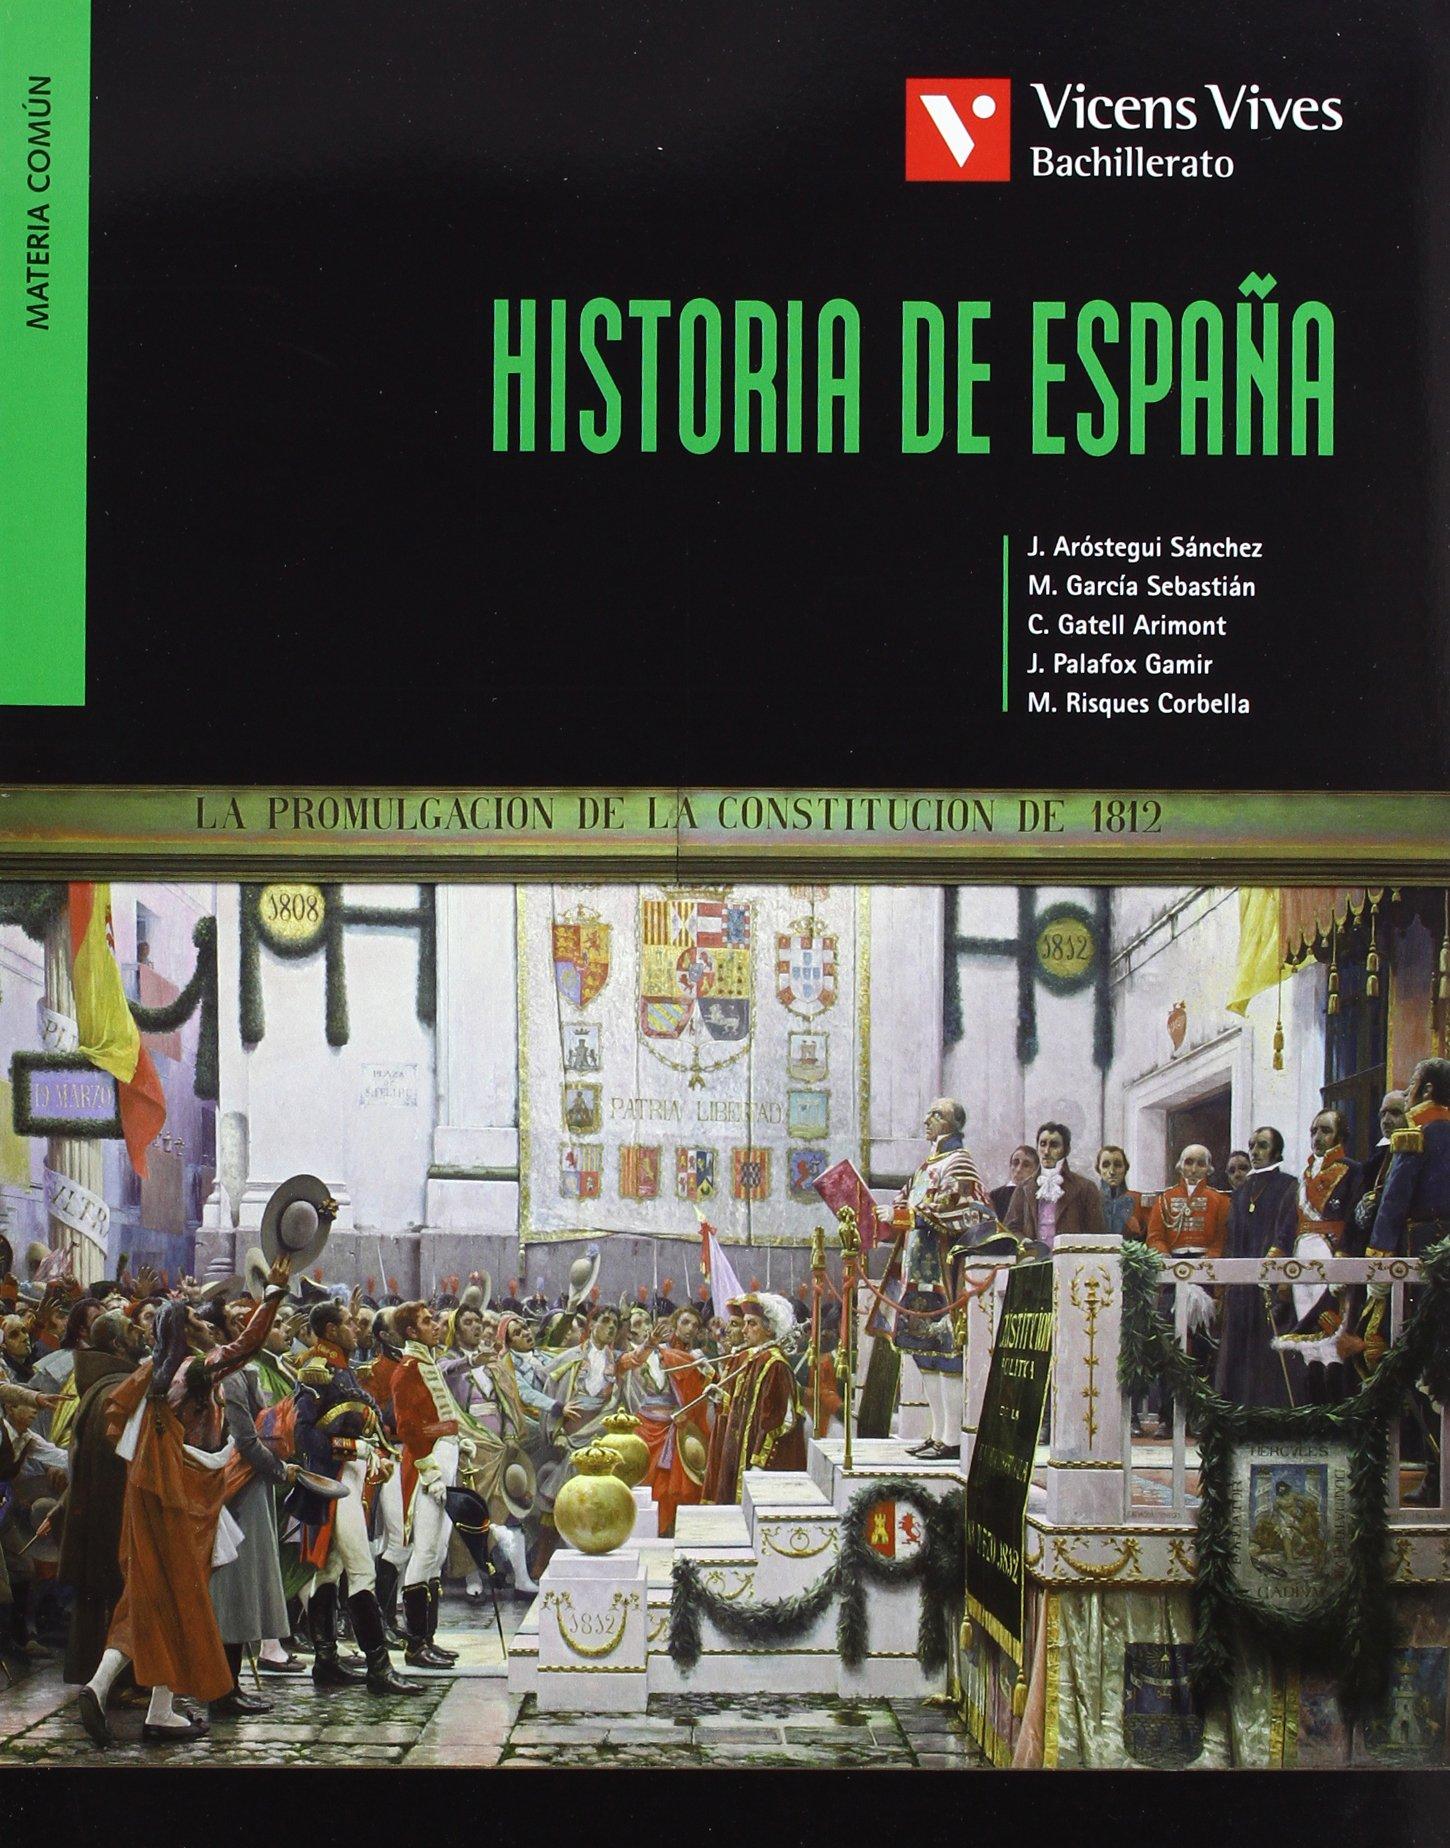 HISTORIA DE ESPAÑA+PAIS VASCO: 000002 - 9788431670870: Amazon.es ...